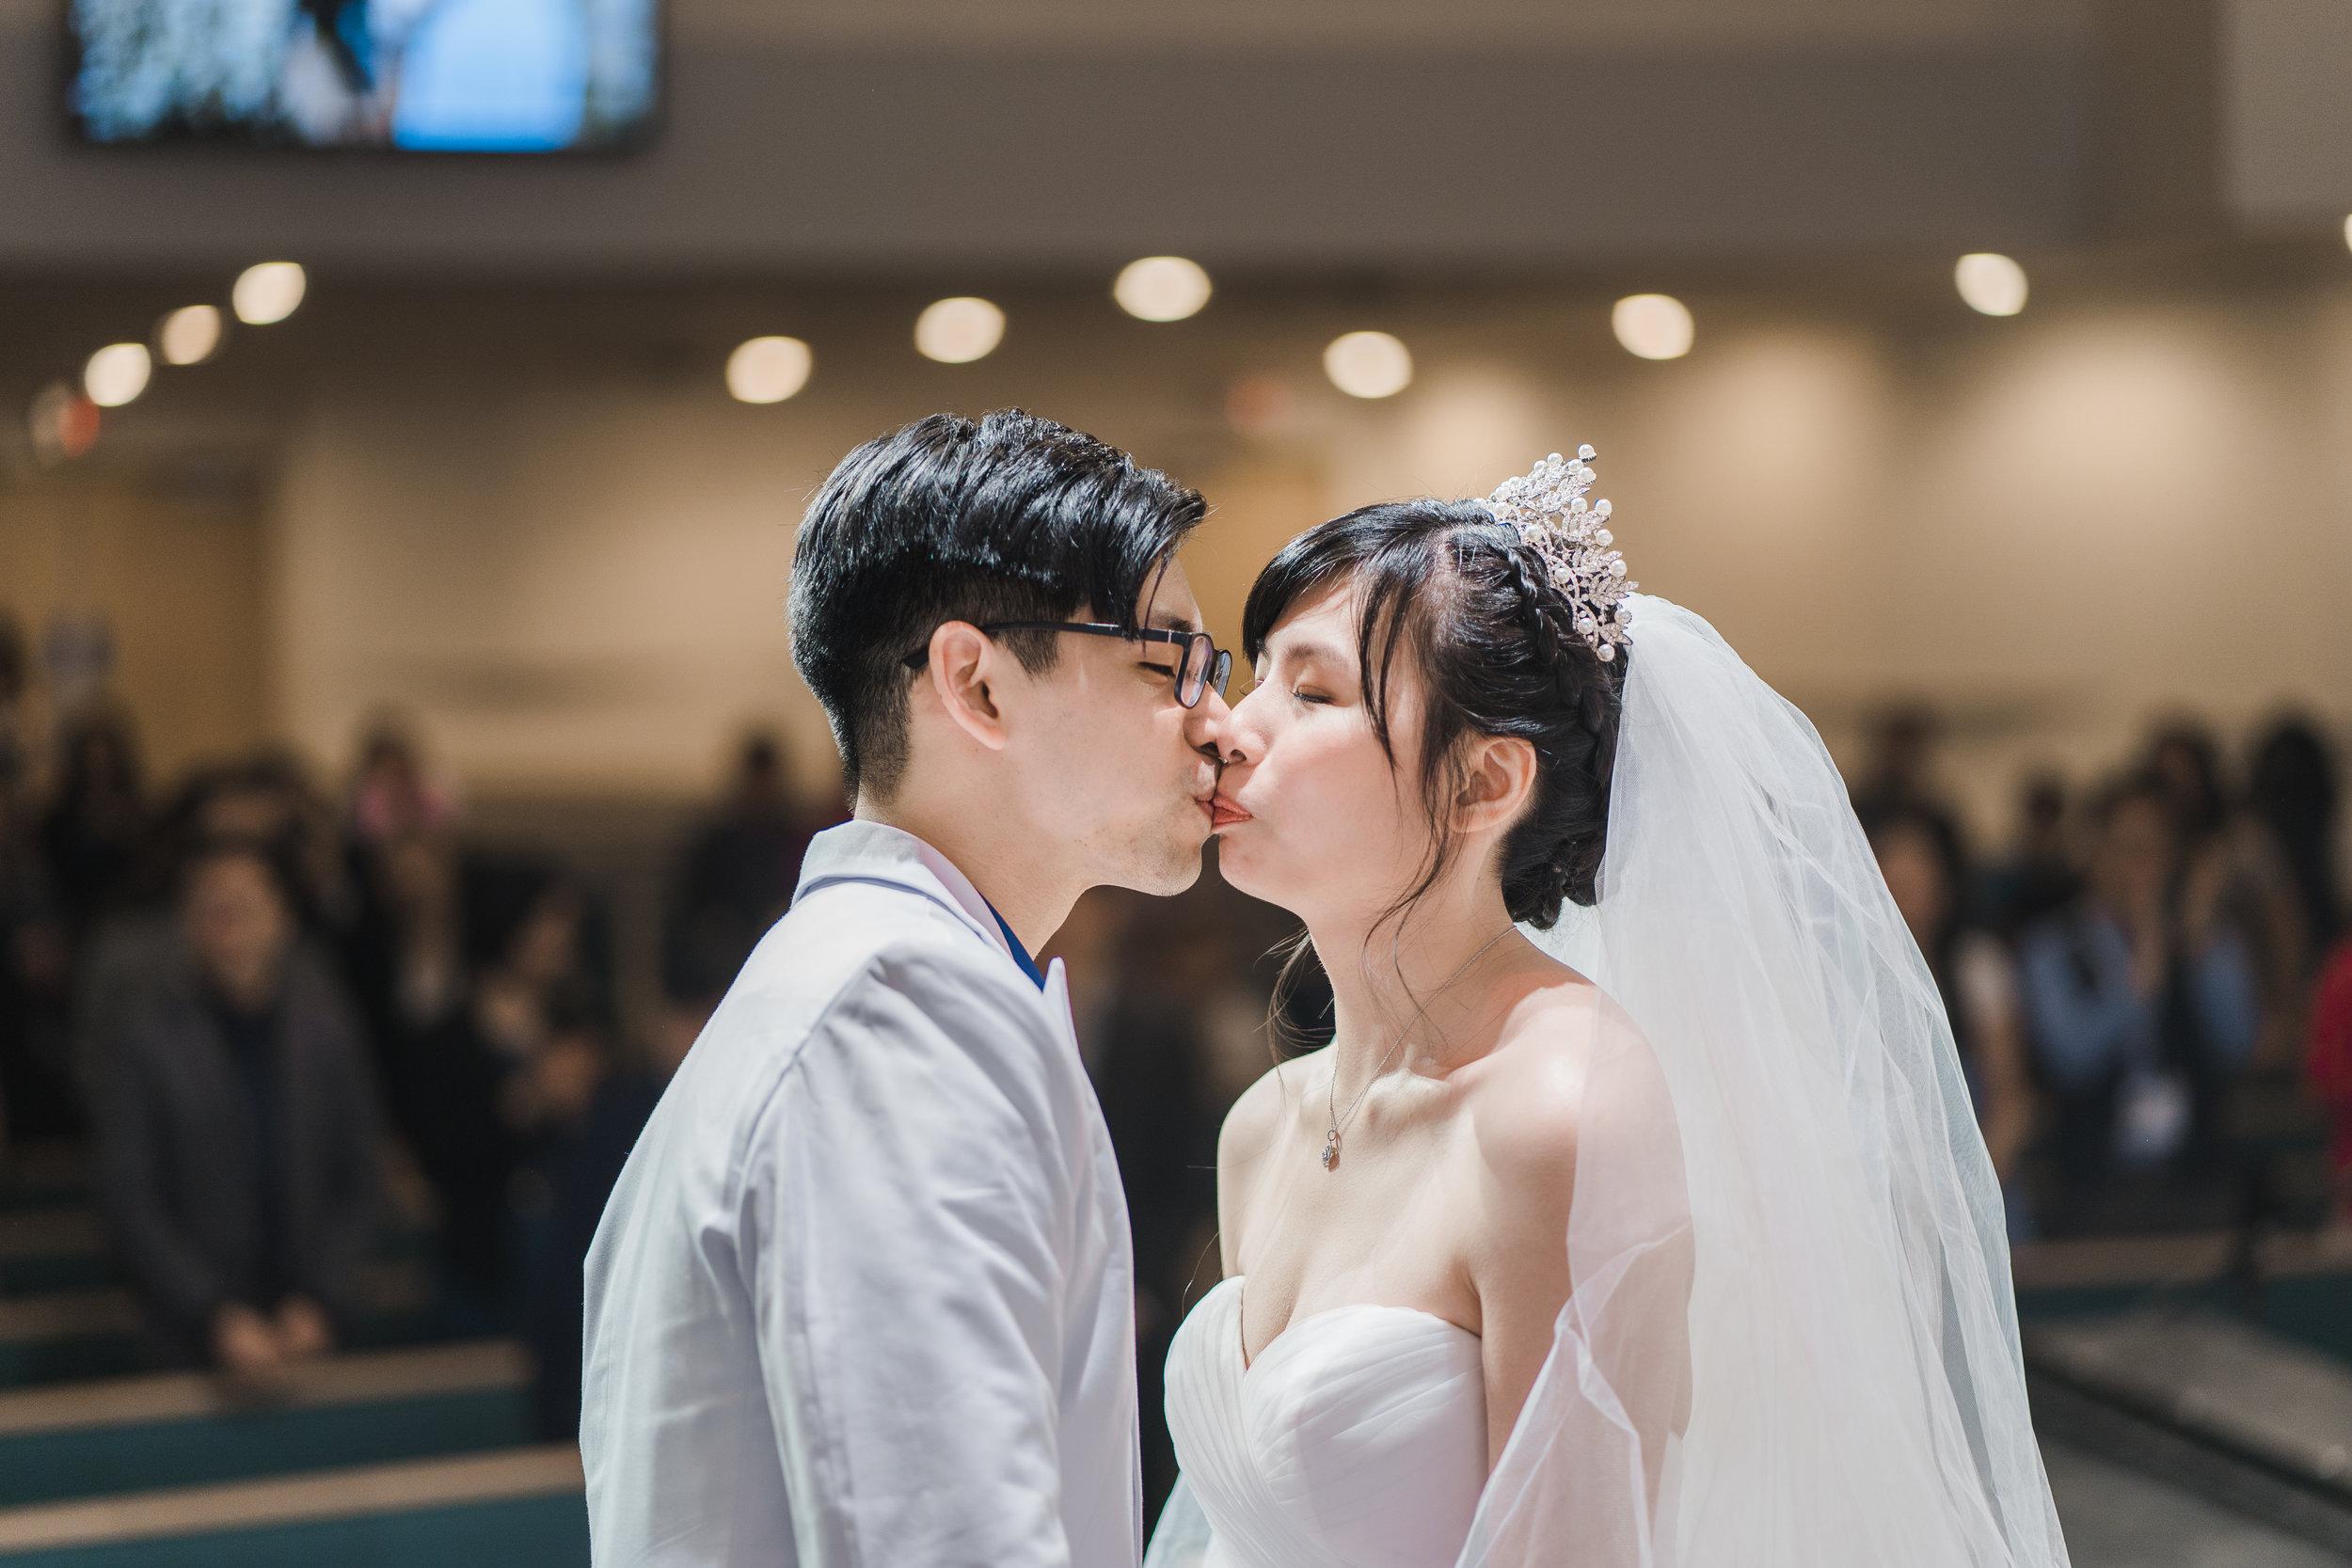 20190520 - Pamela & Matthew Wedding - 0163.jpg